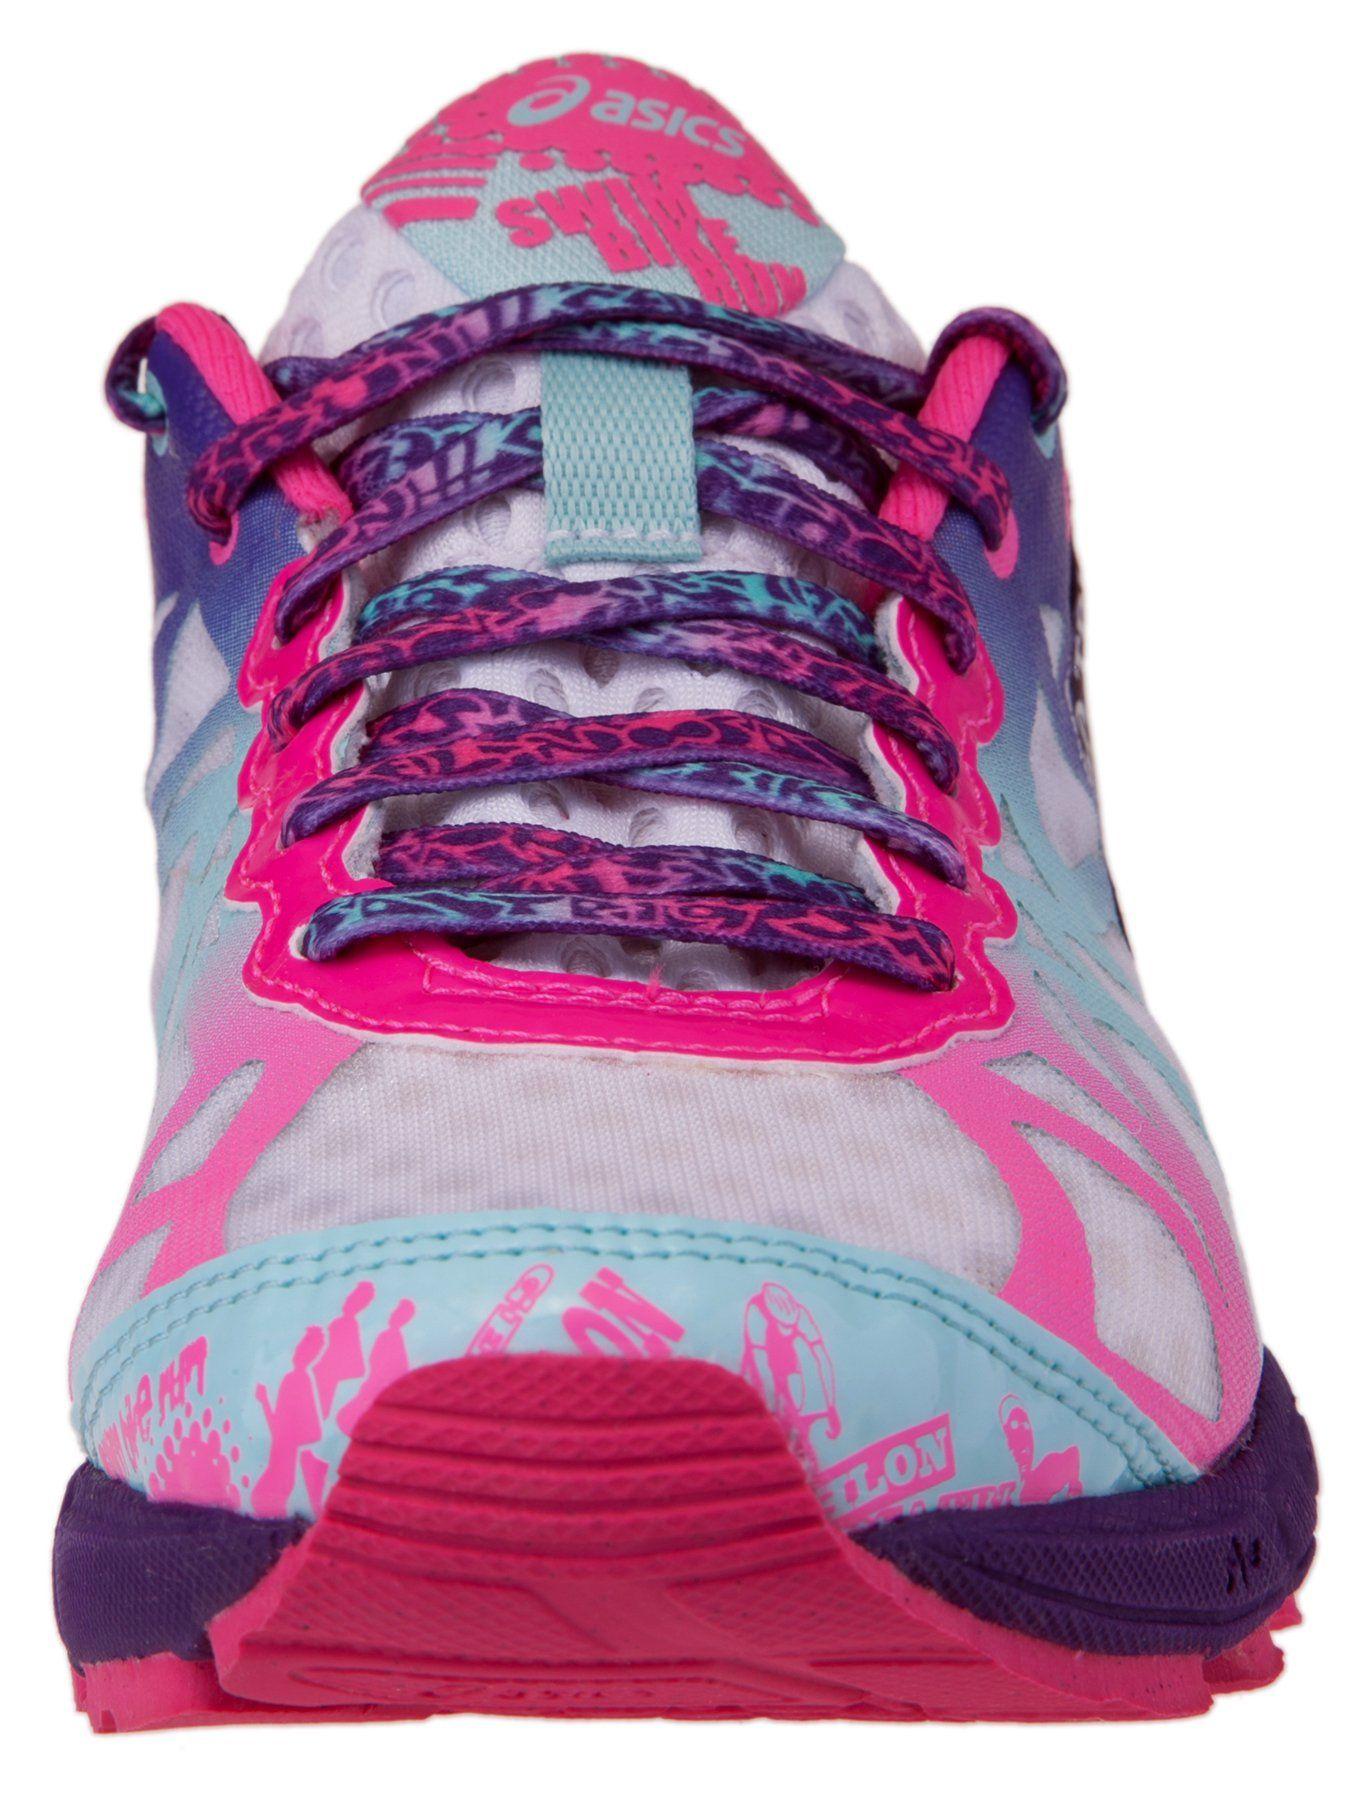 buy online 87094 94d5e ASICS Women s Gel-Noosa Tri 9 Running Shoe,Black Neon Coral Green,8 M US